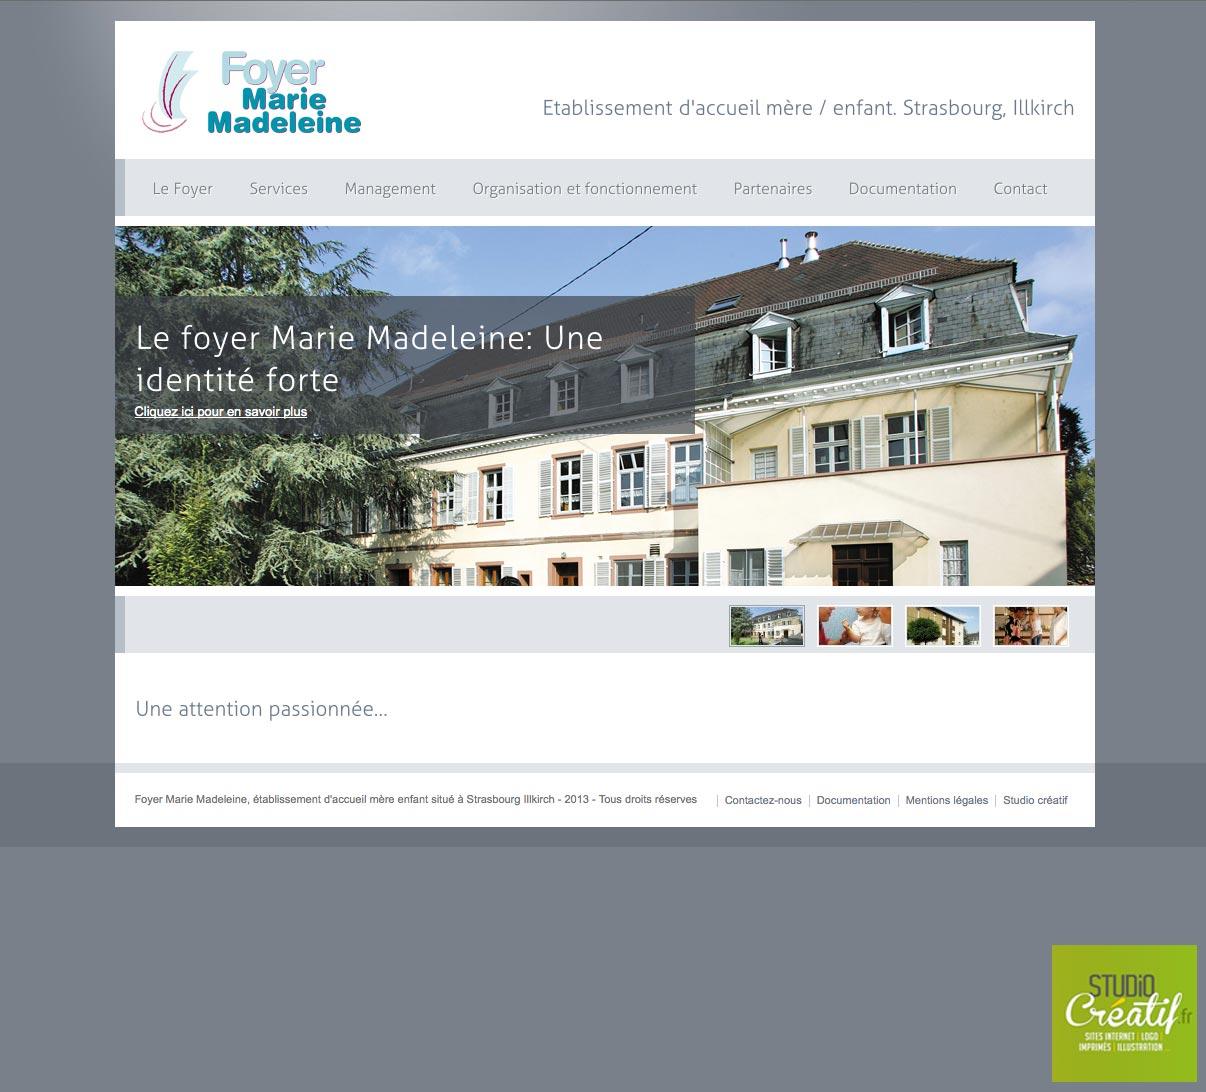 foyer-marie-madeleine-page-accueil-brumath site internet